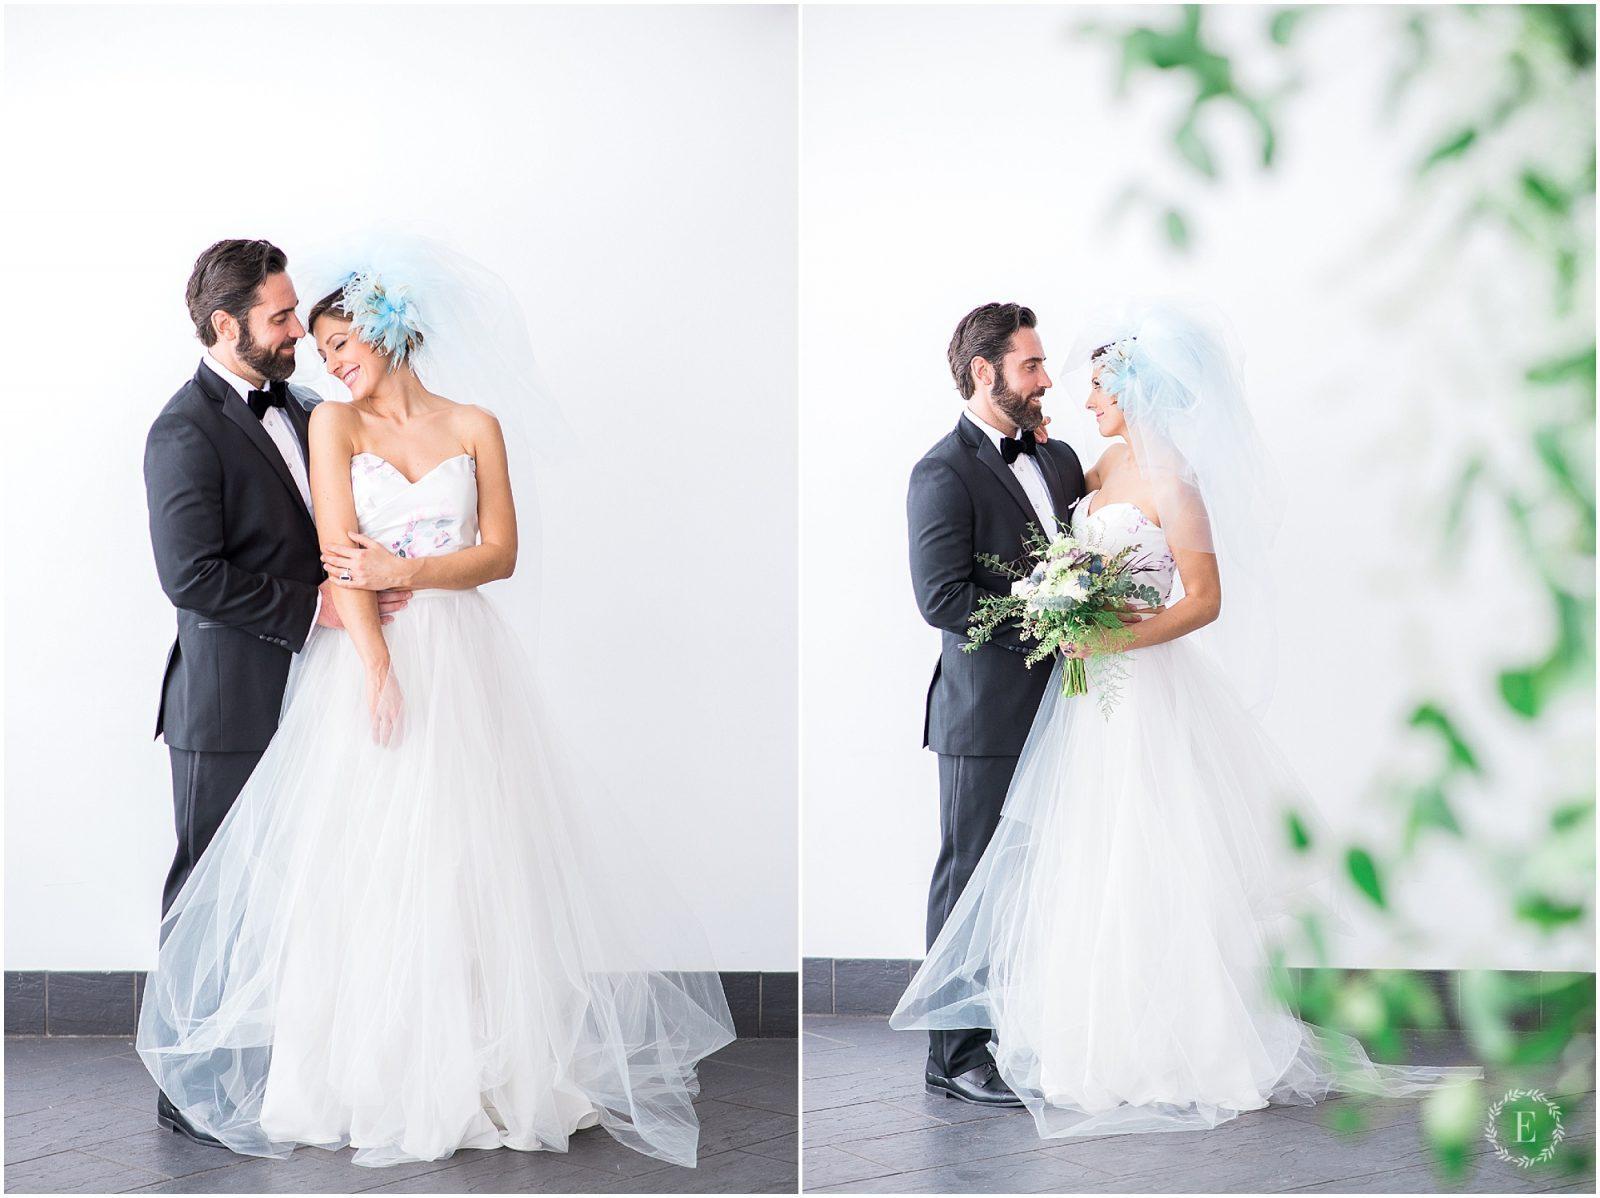 137 Carrie-John-Wedding-Styled-shoot-sex and the city-photosbyemmah.jpg